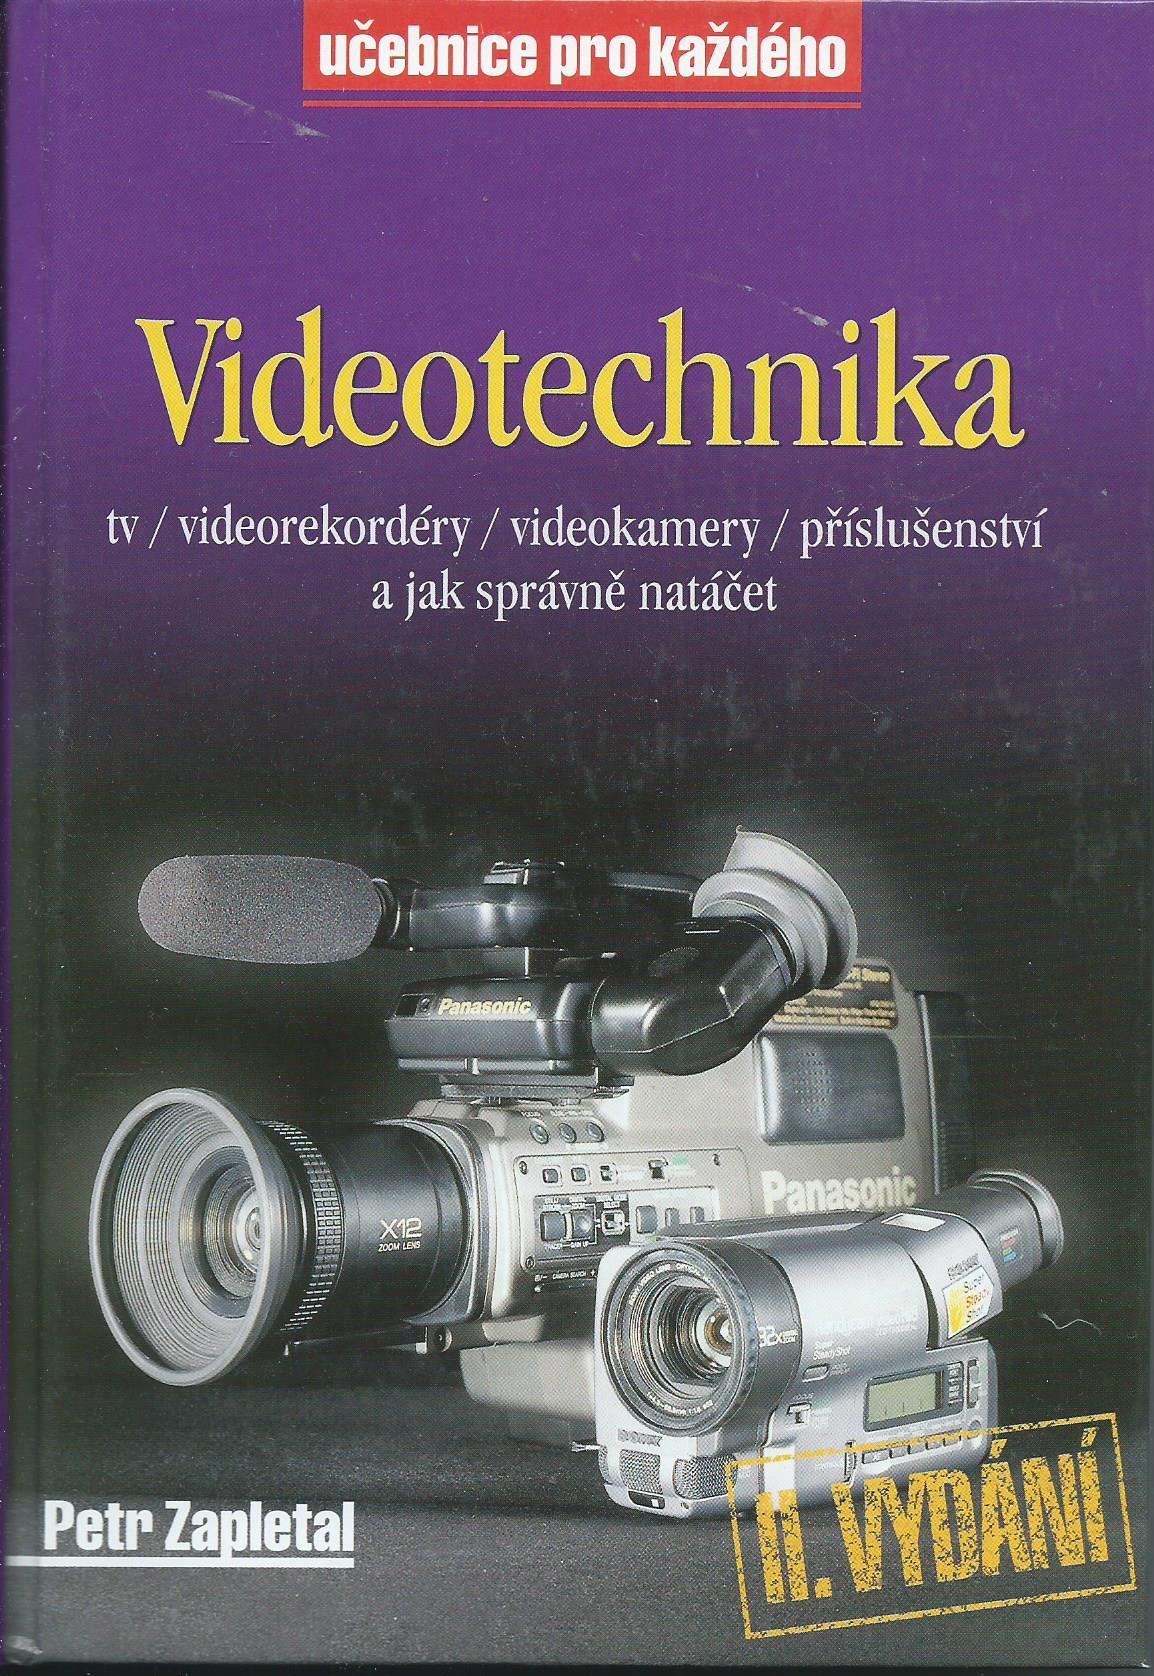 Videotechnika - Petr Zapletal